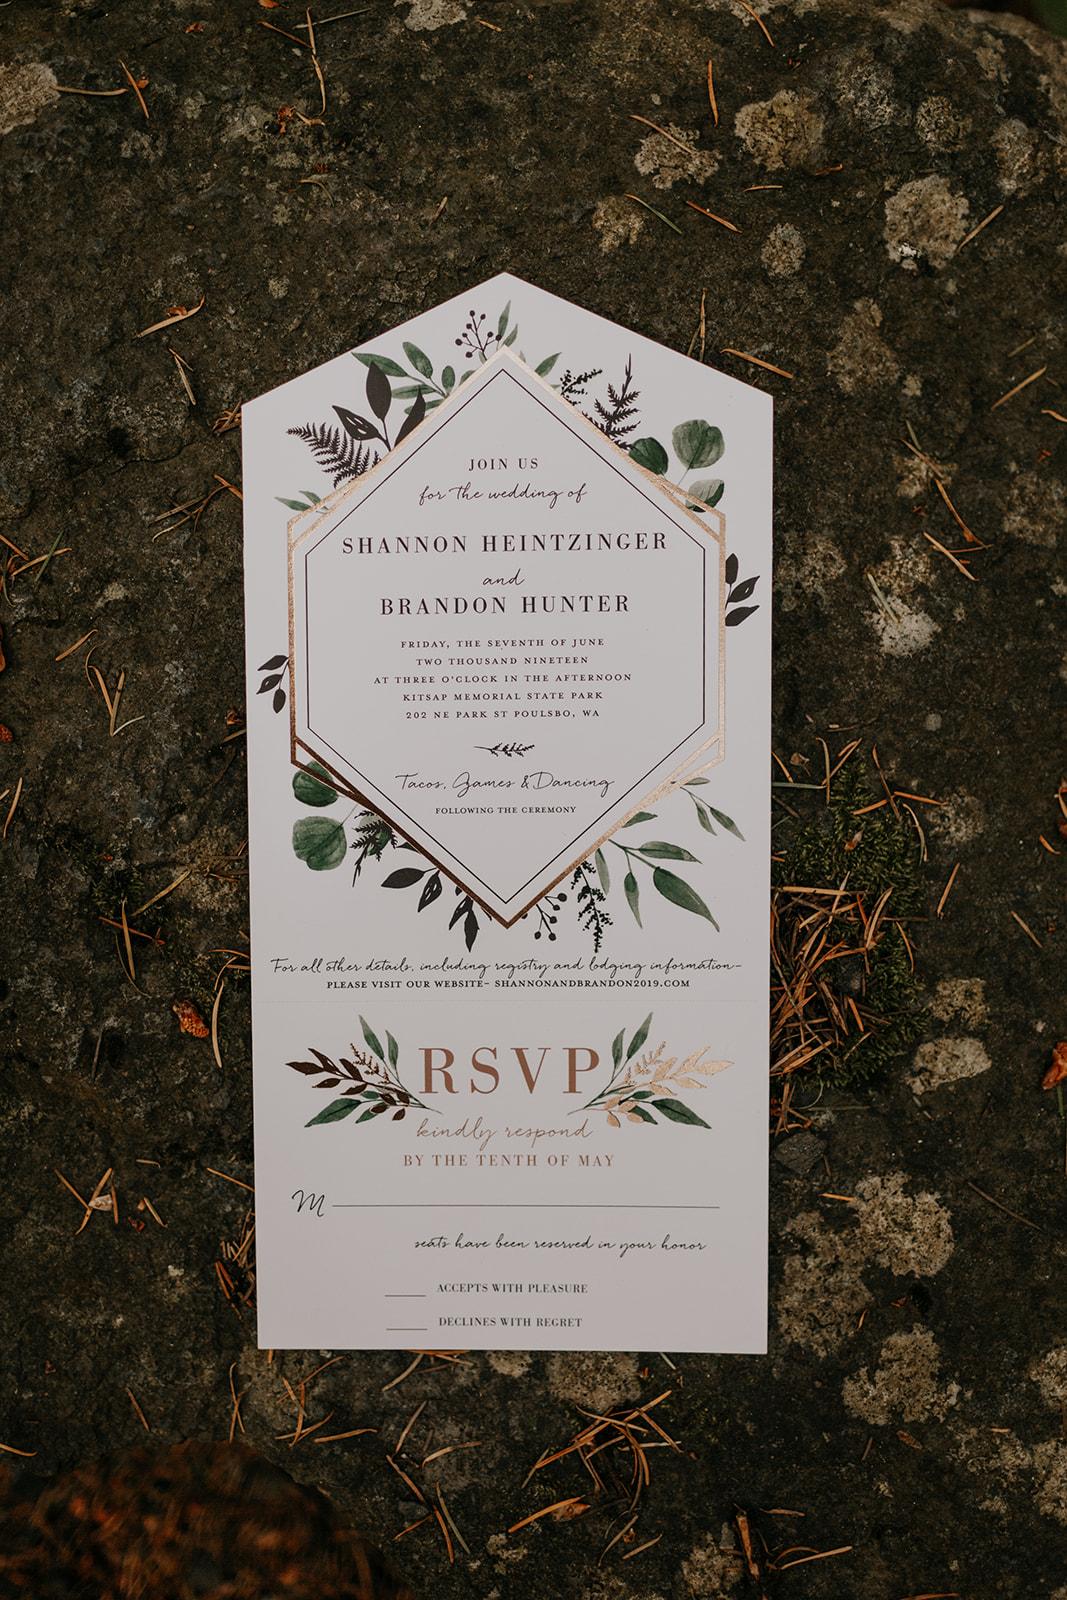 ginapaulson_shannonandbrandonwedding-1.jpg